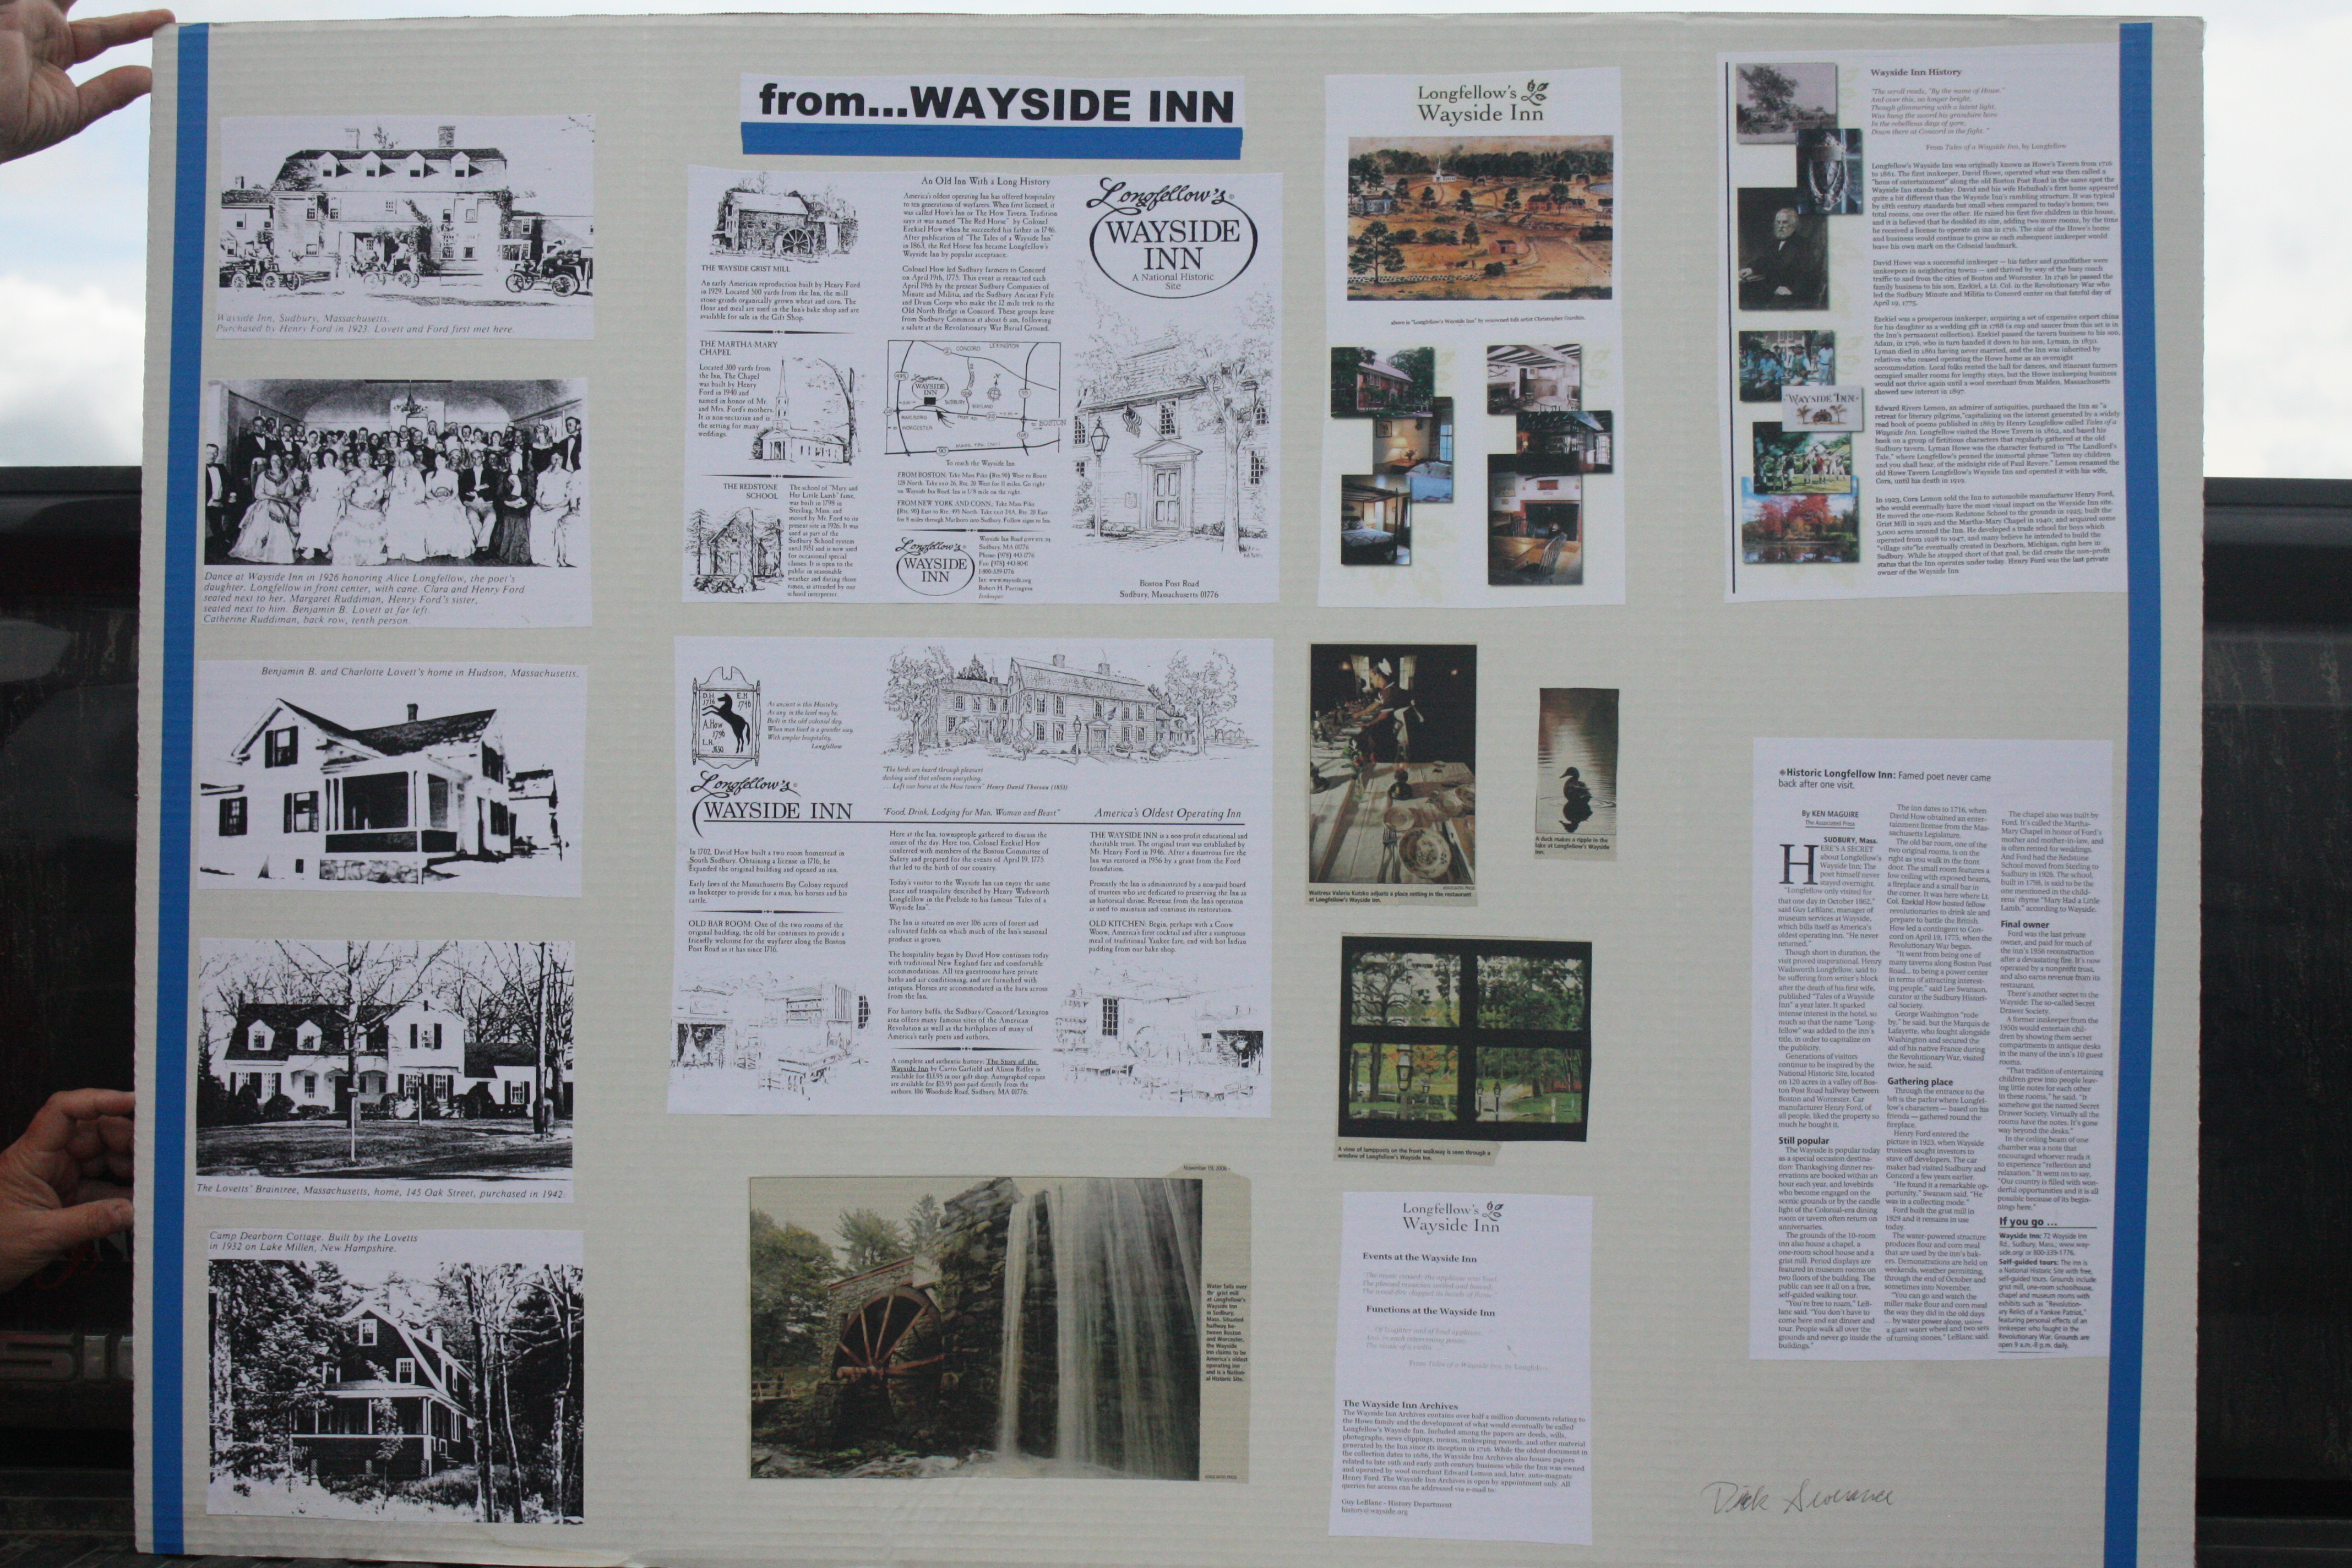 Panel #10(Wayside Inn)